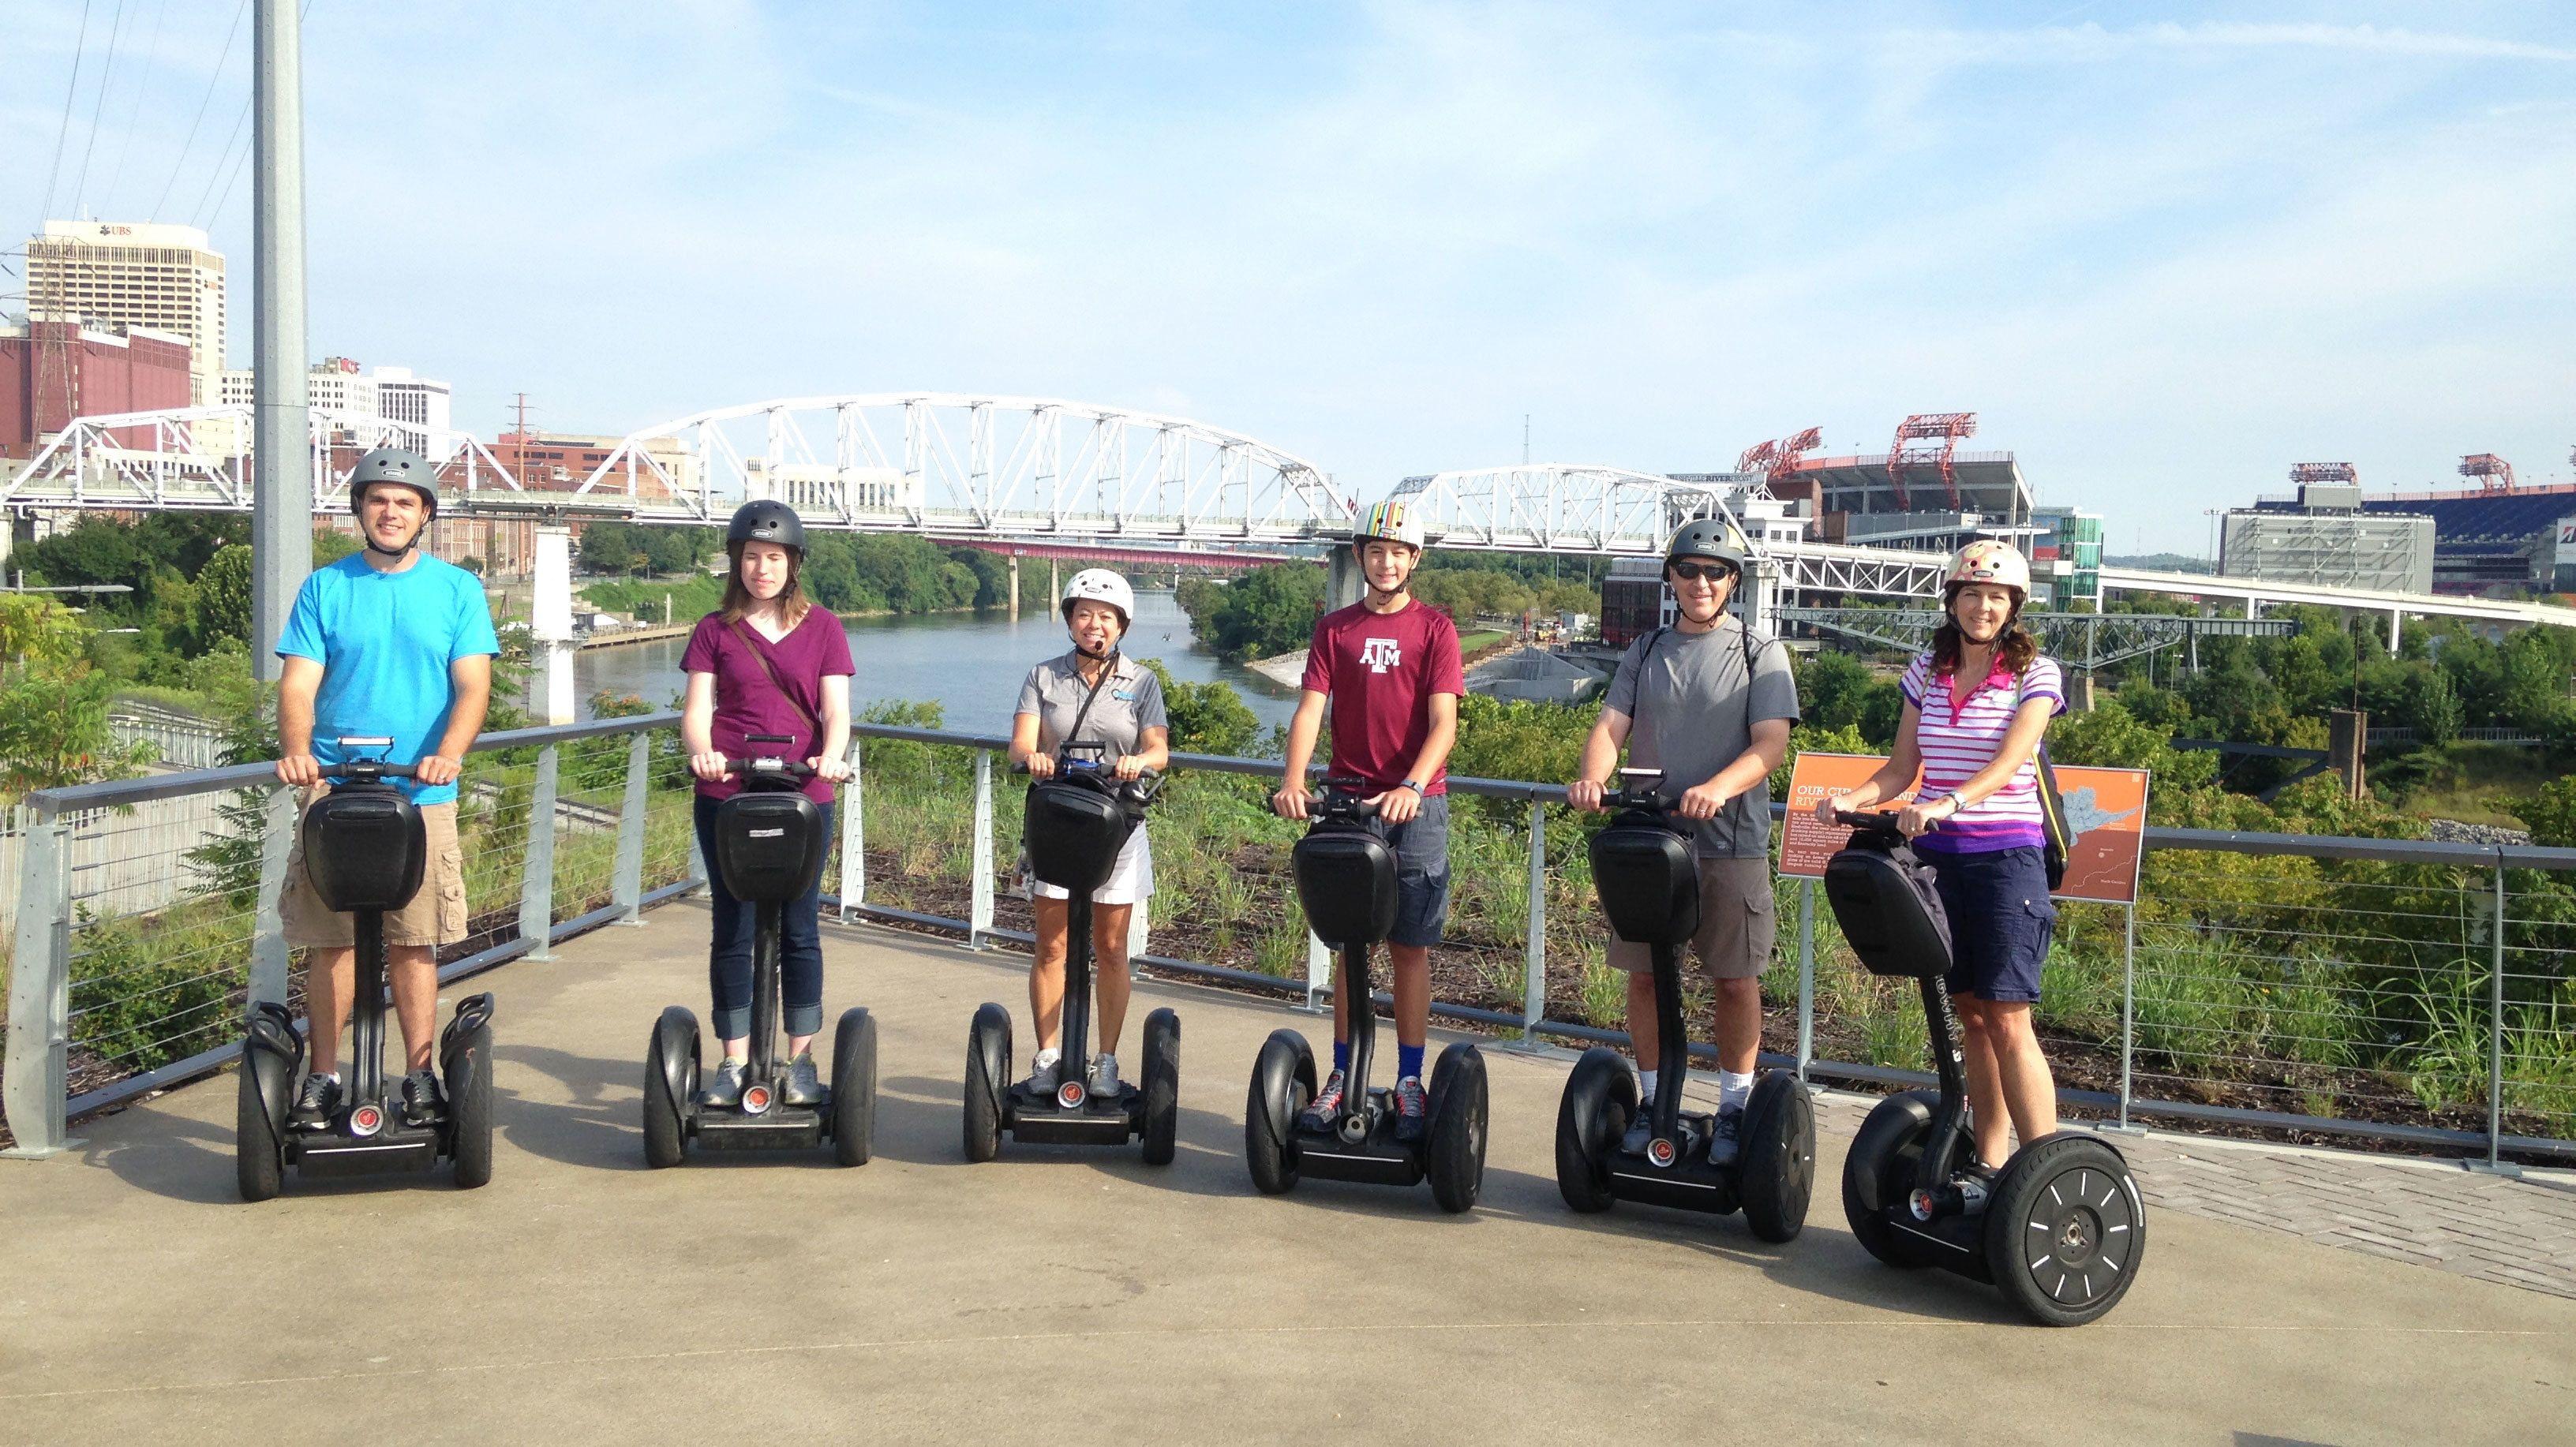 Segway group in front of bridge in Nashville